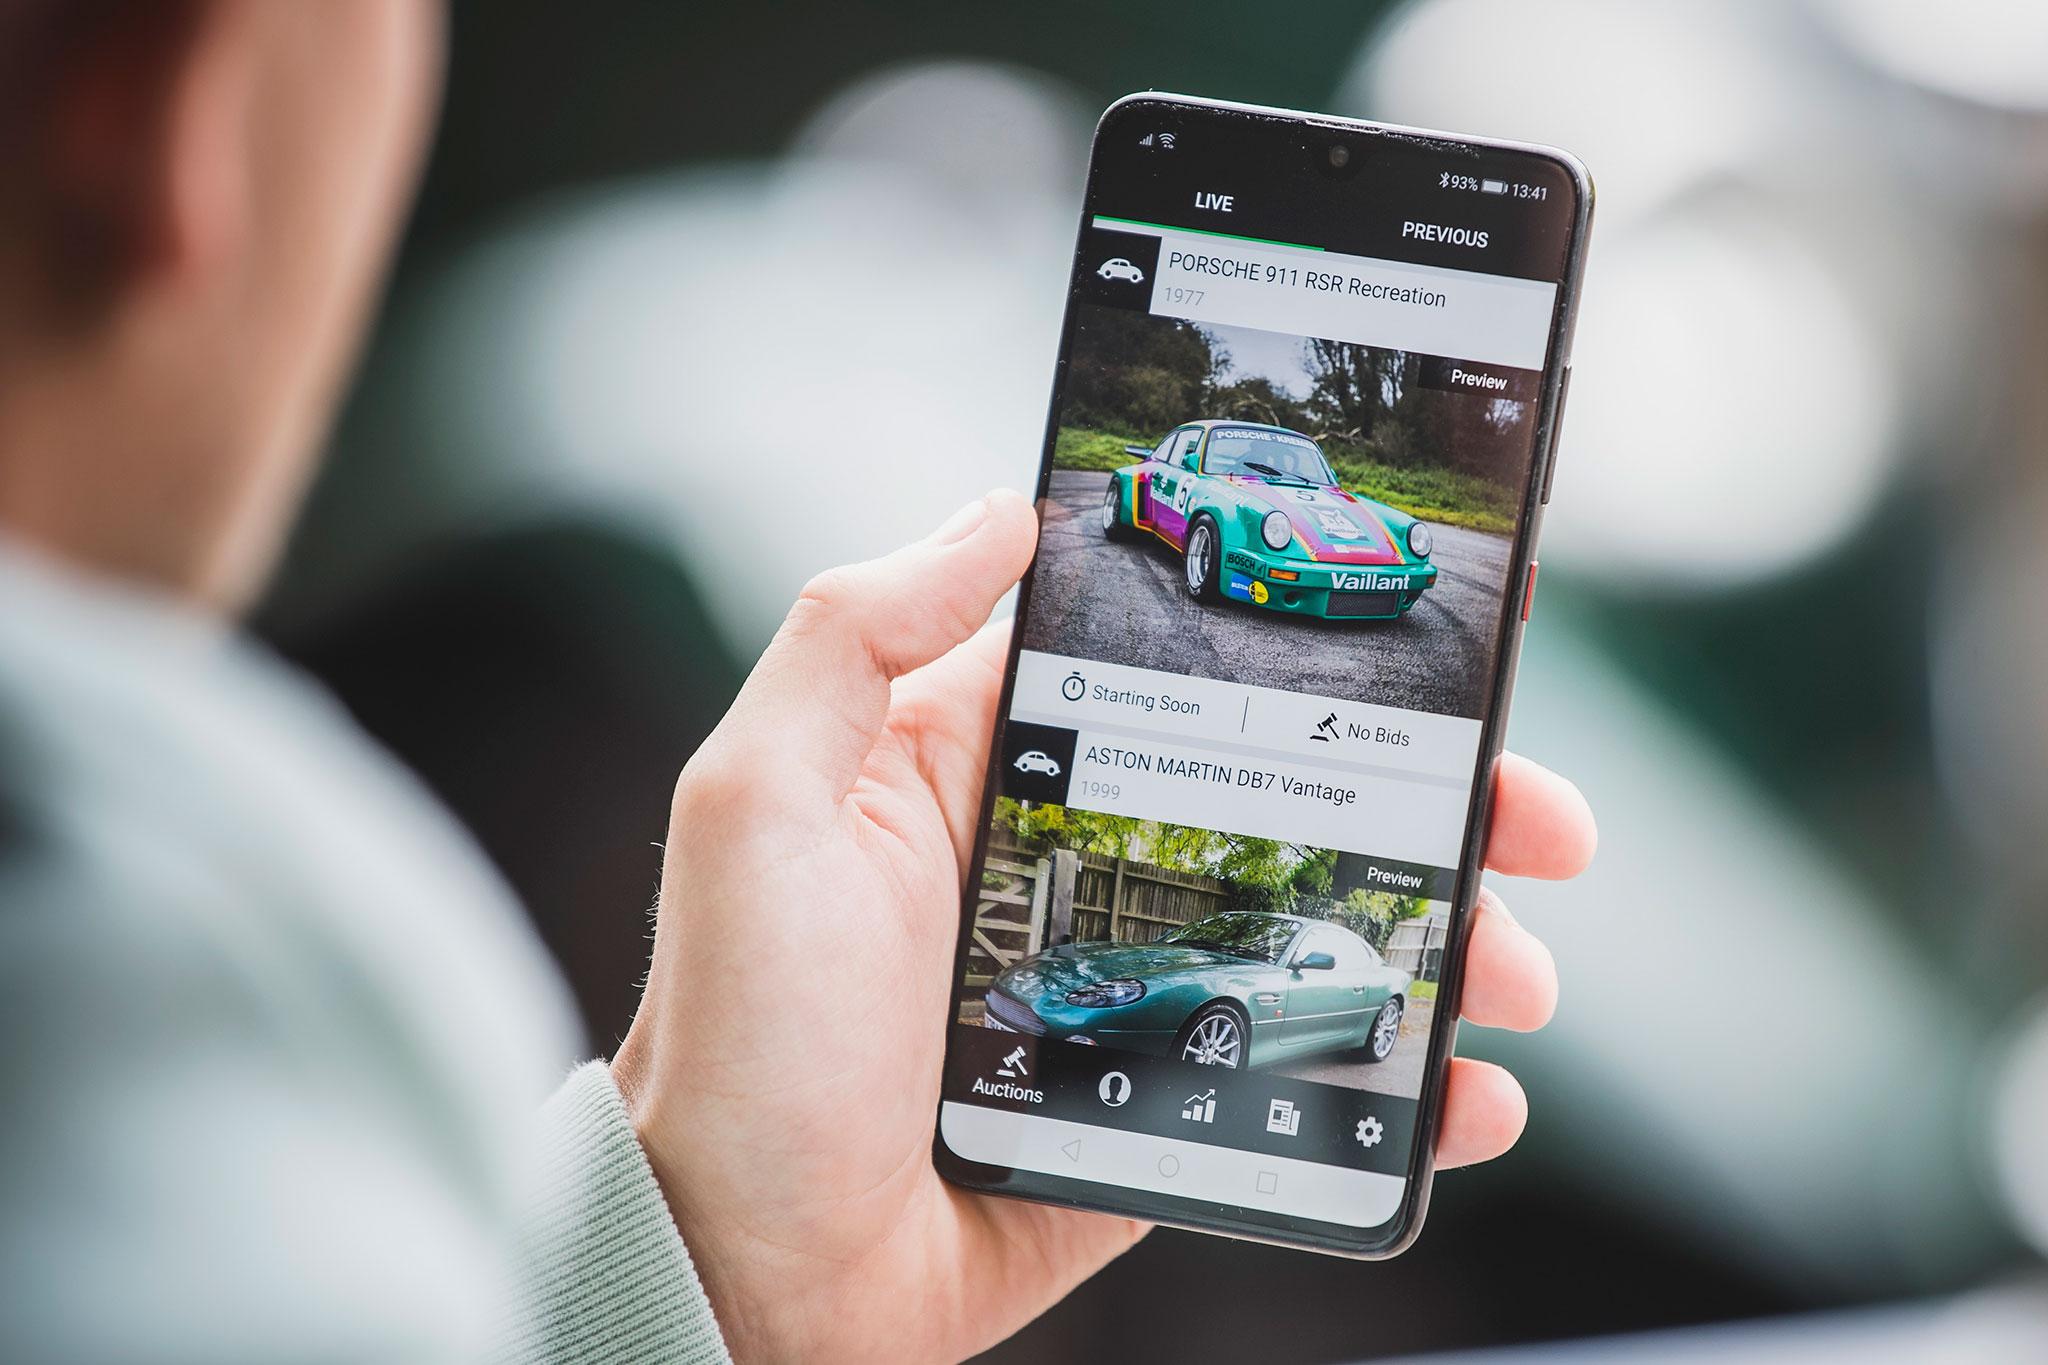 The Market App on smartphone - The Market by Bonhams.